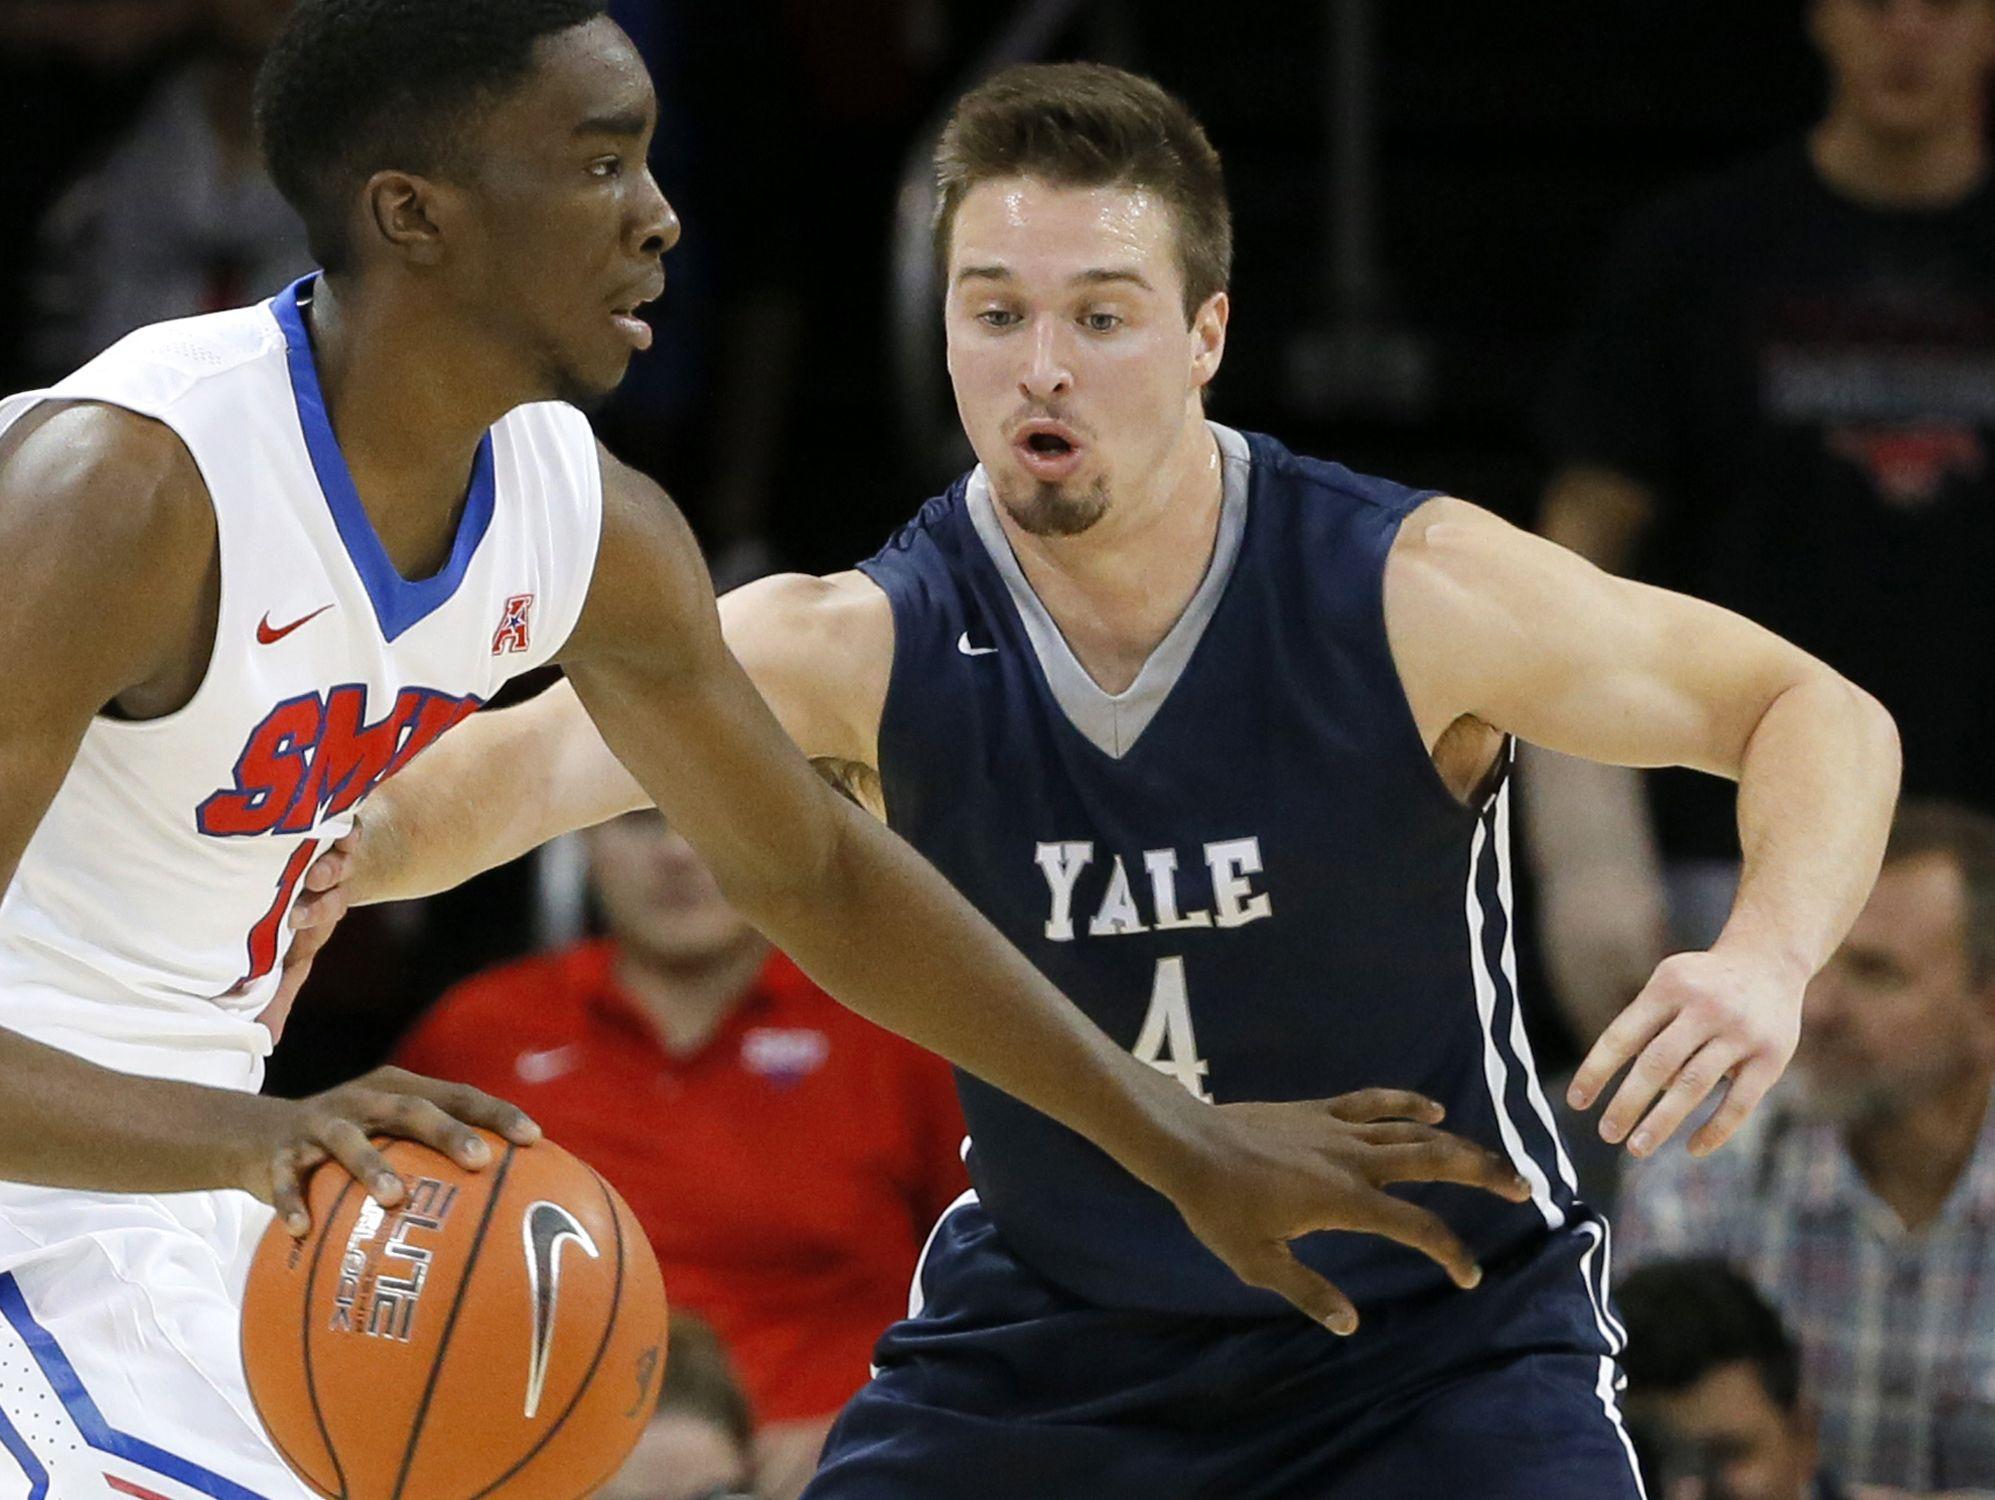 Yale's Jack Montague, right, defends against SMU guard Shake Milton on Nov. 22, 2015.